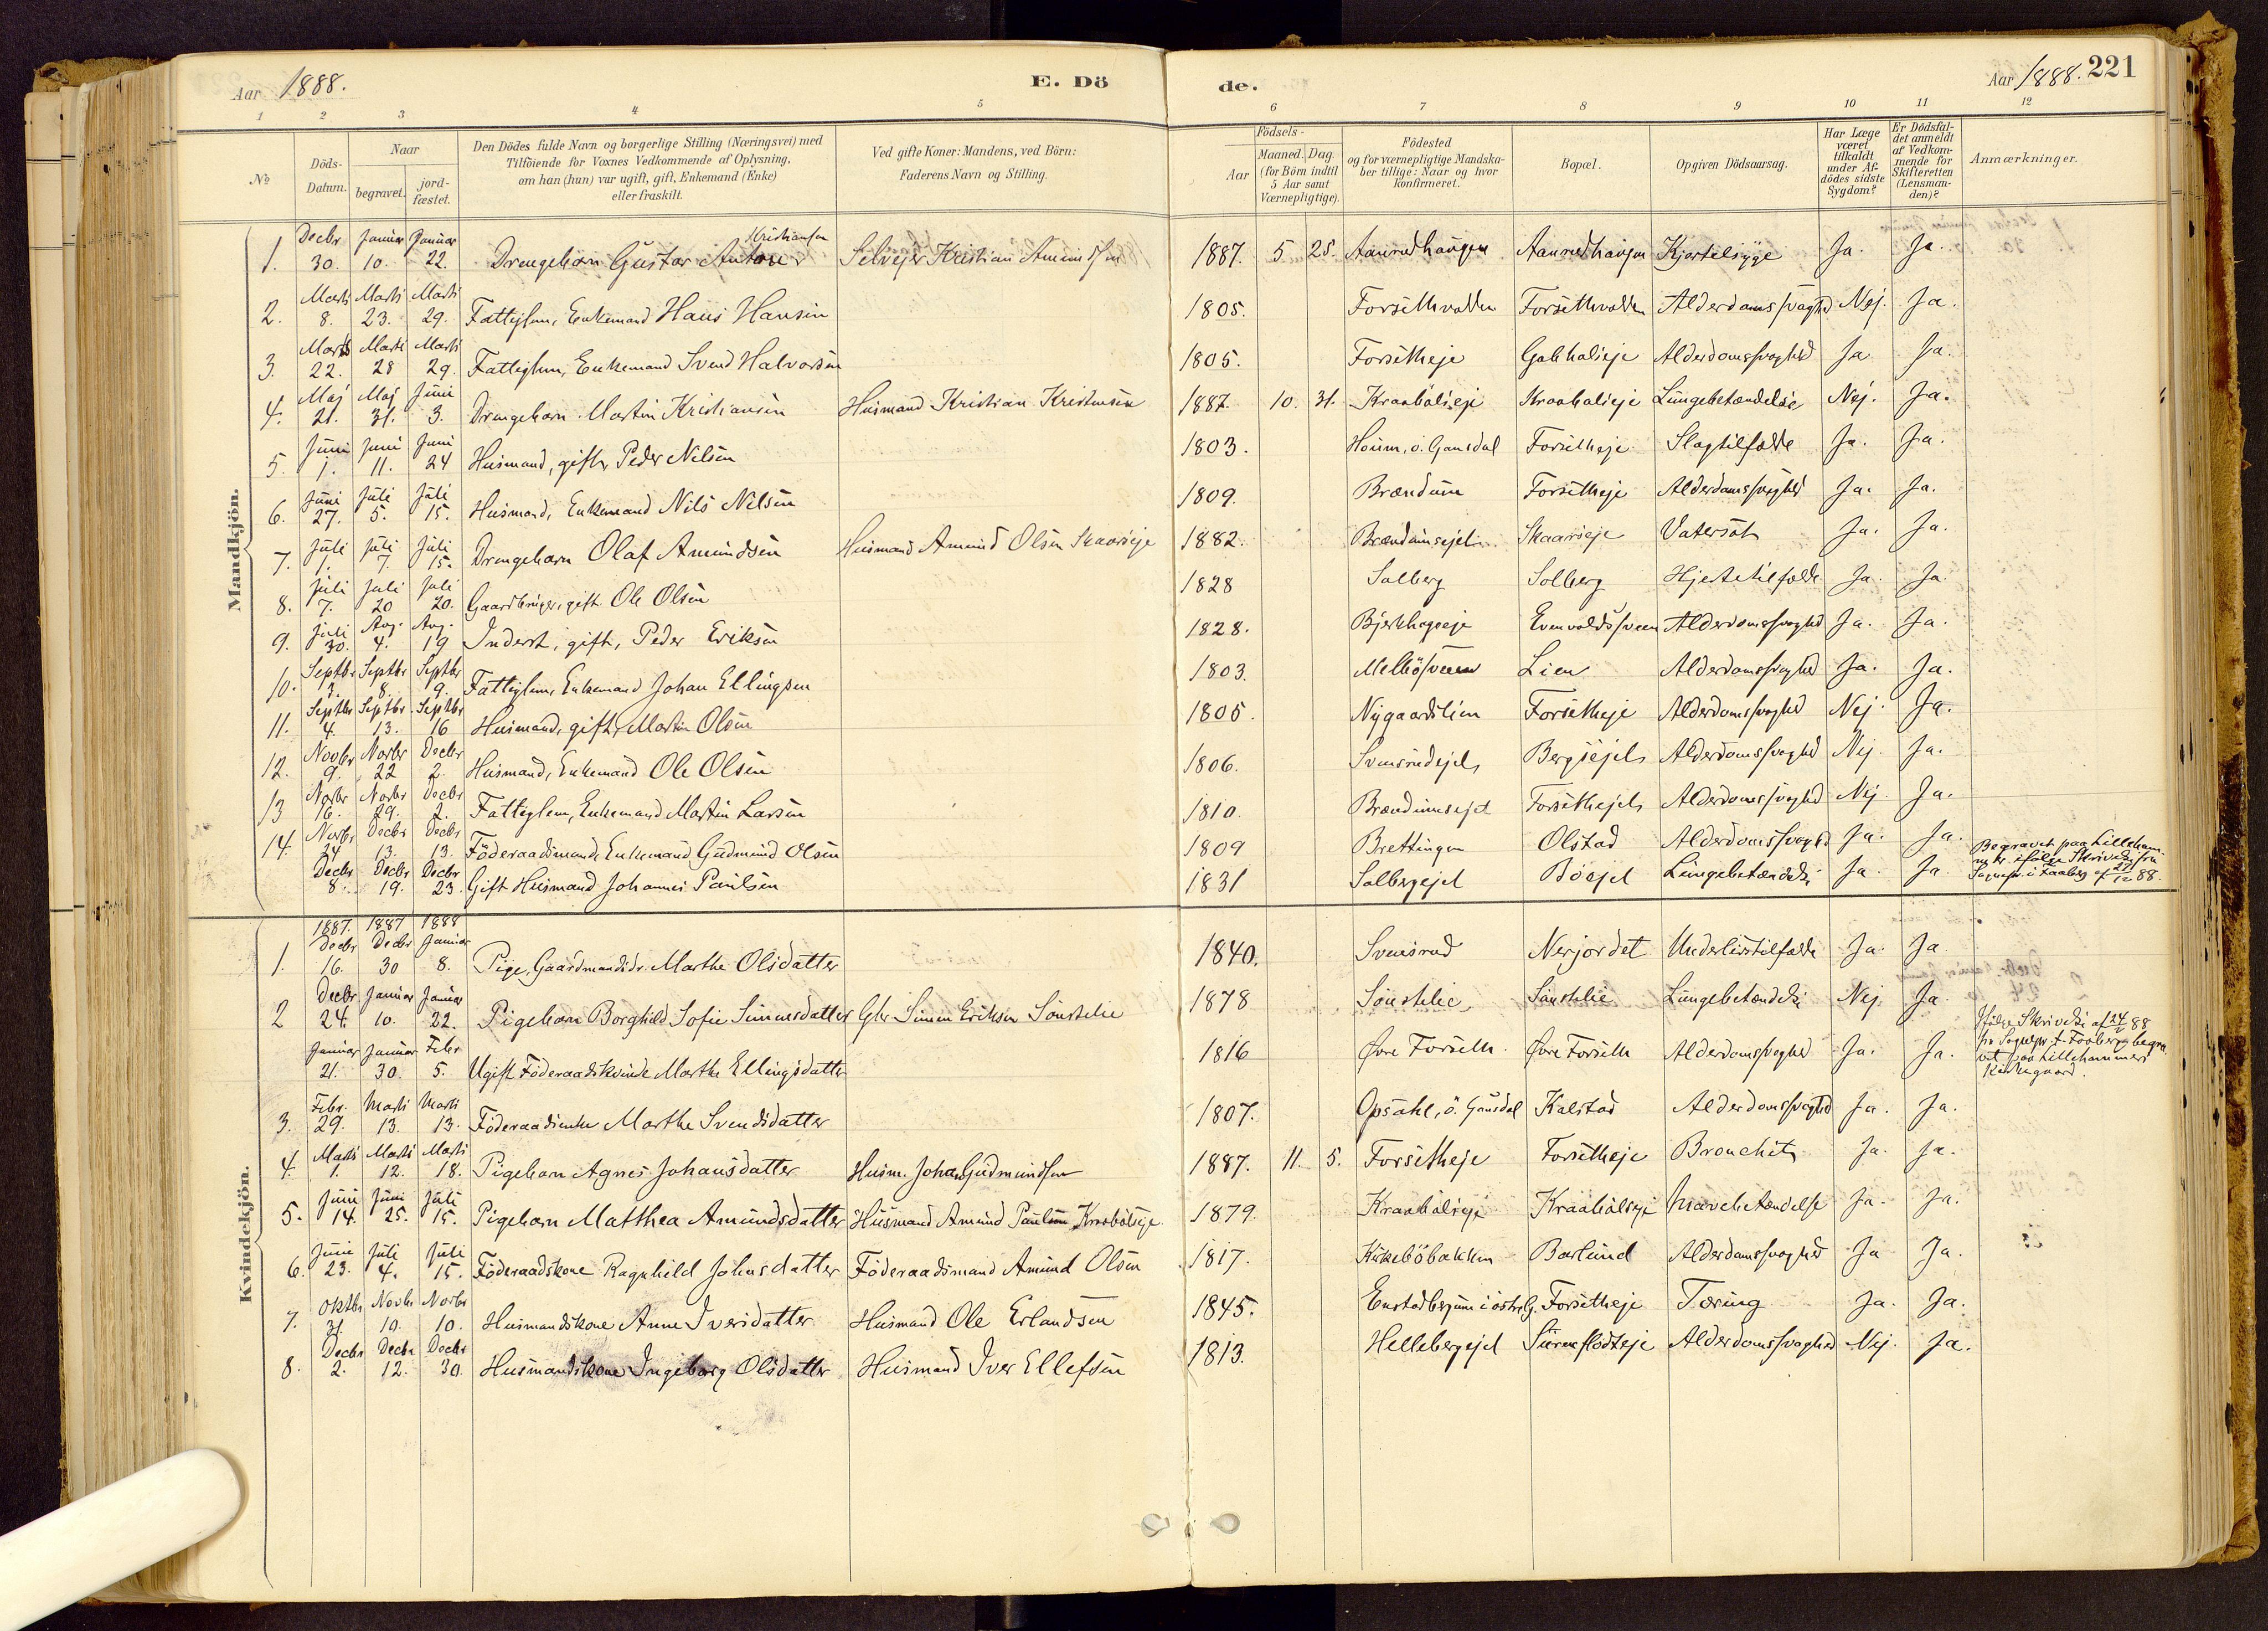 SAH, Vestre Gausdal prestekontor, Ministerialbok nr. 1, 1887-1914, s. 221